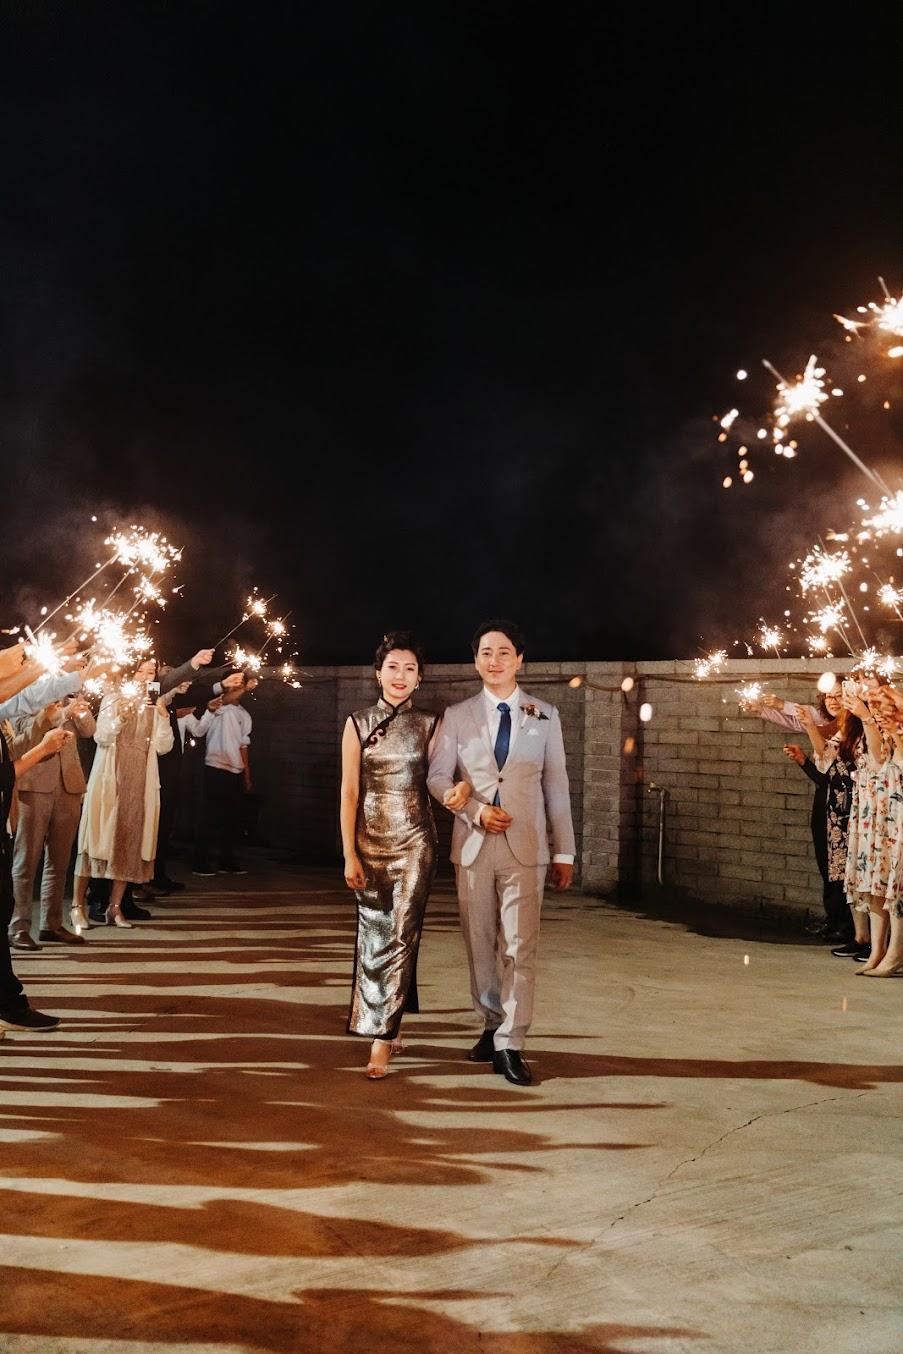 undefined自宅婚禮派對 | IVANKA+JIMMY WEDDING PARTY | 美式婚攝-小型婚禮